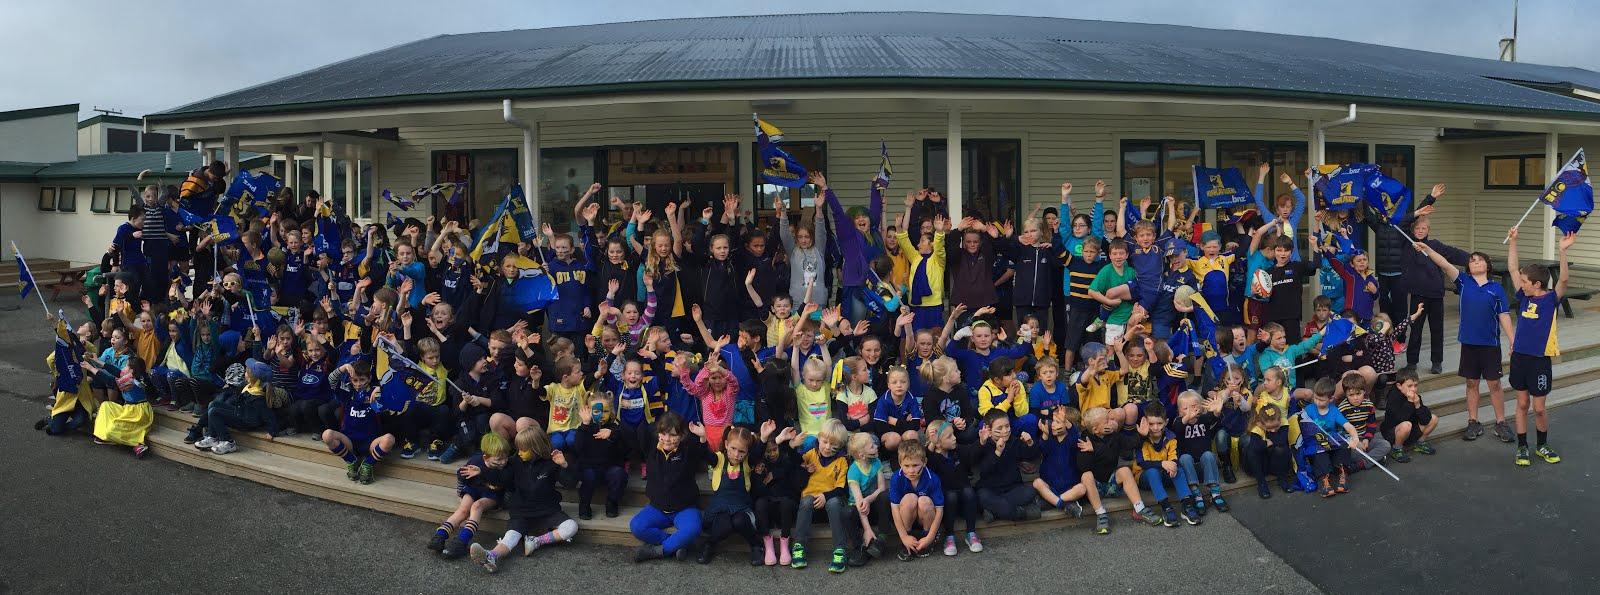 School Highlanders photos.jpg